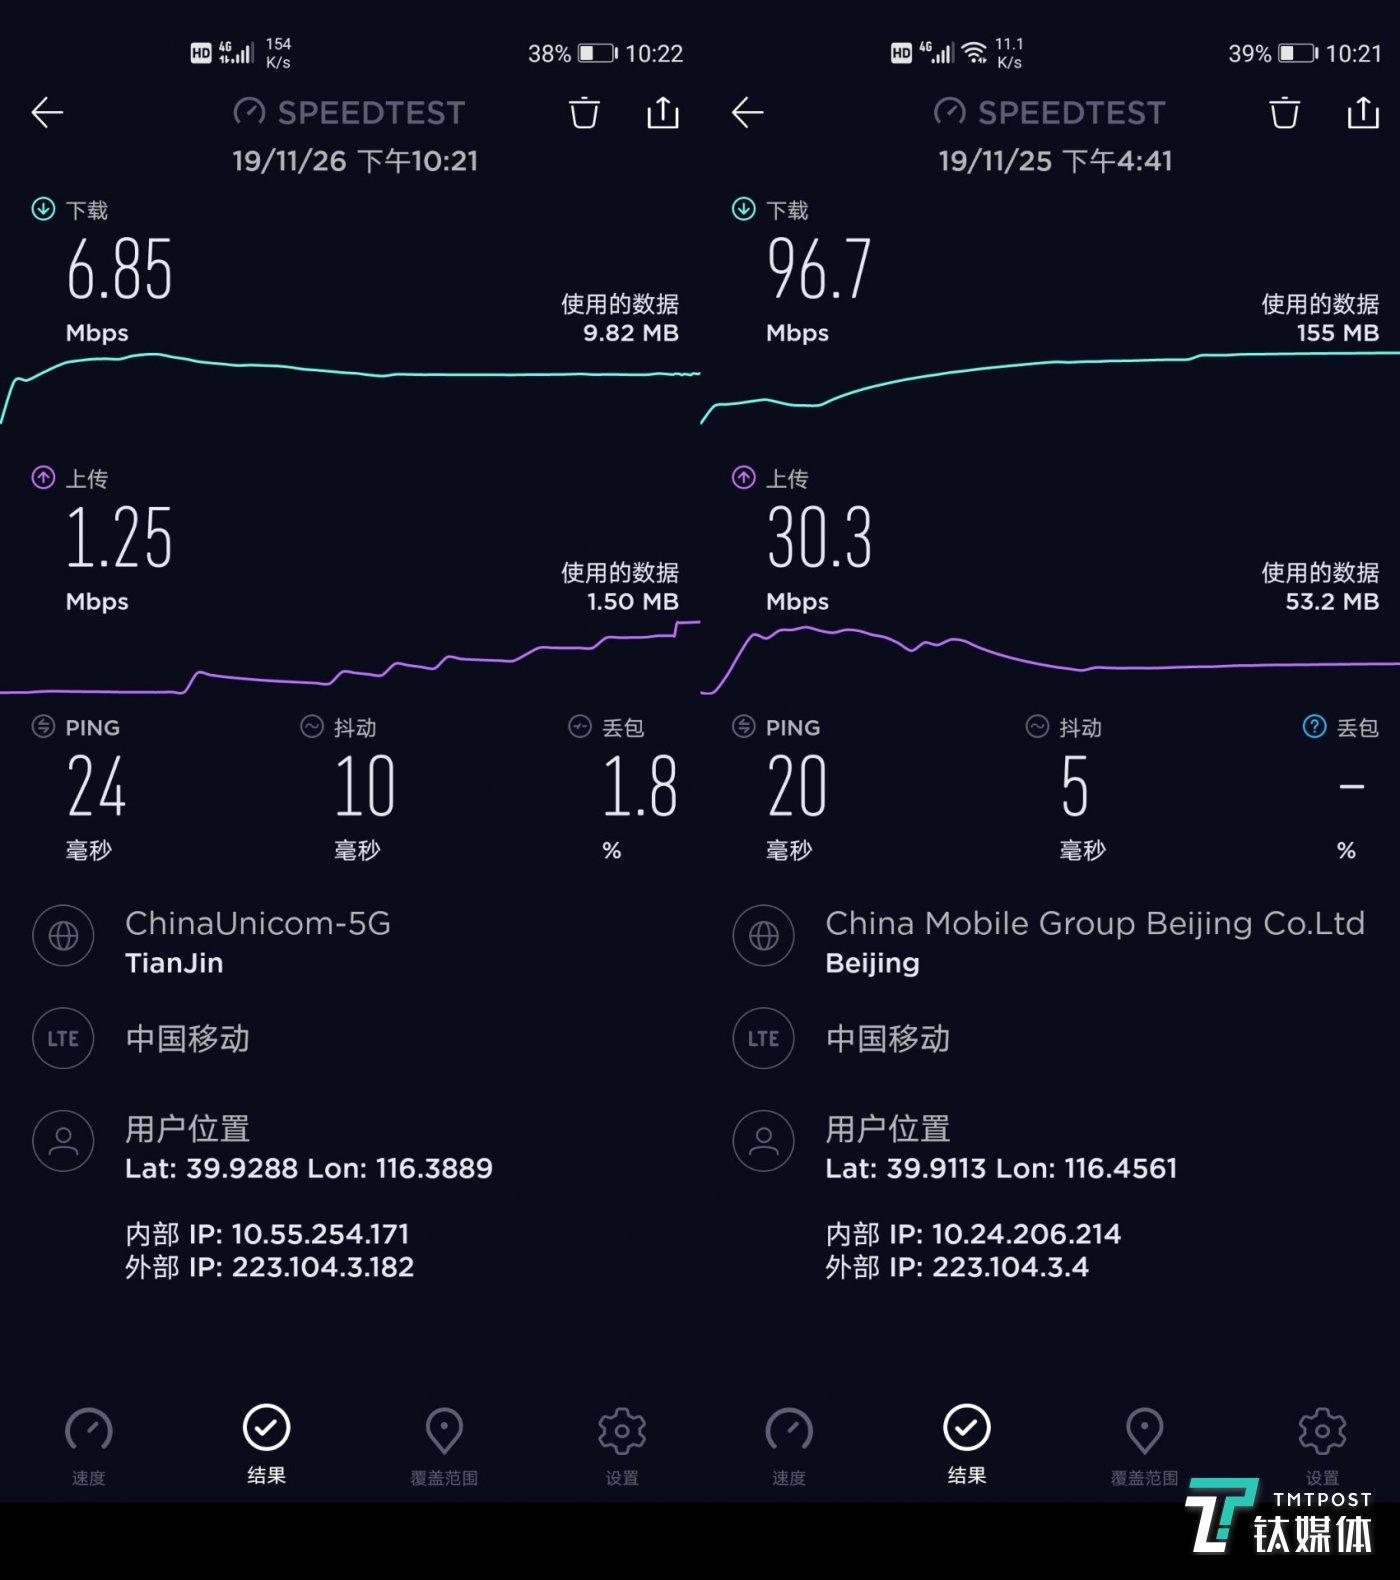 4G、5G网速对比,差异非常明显